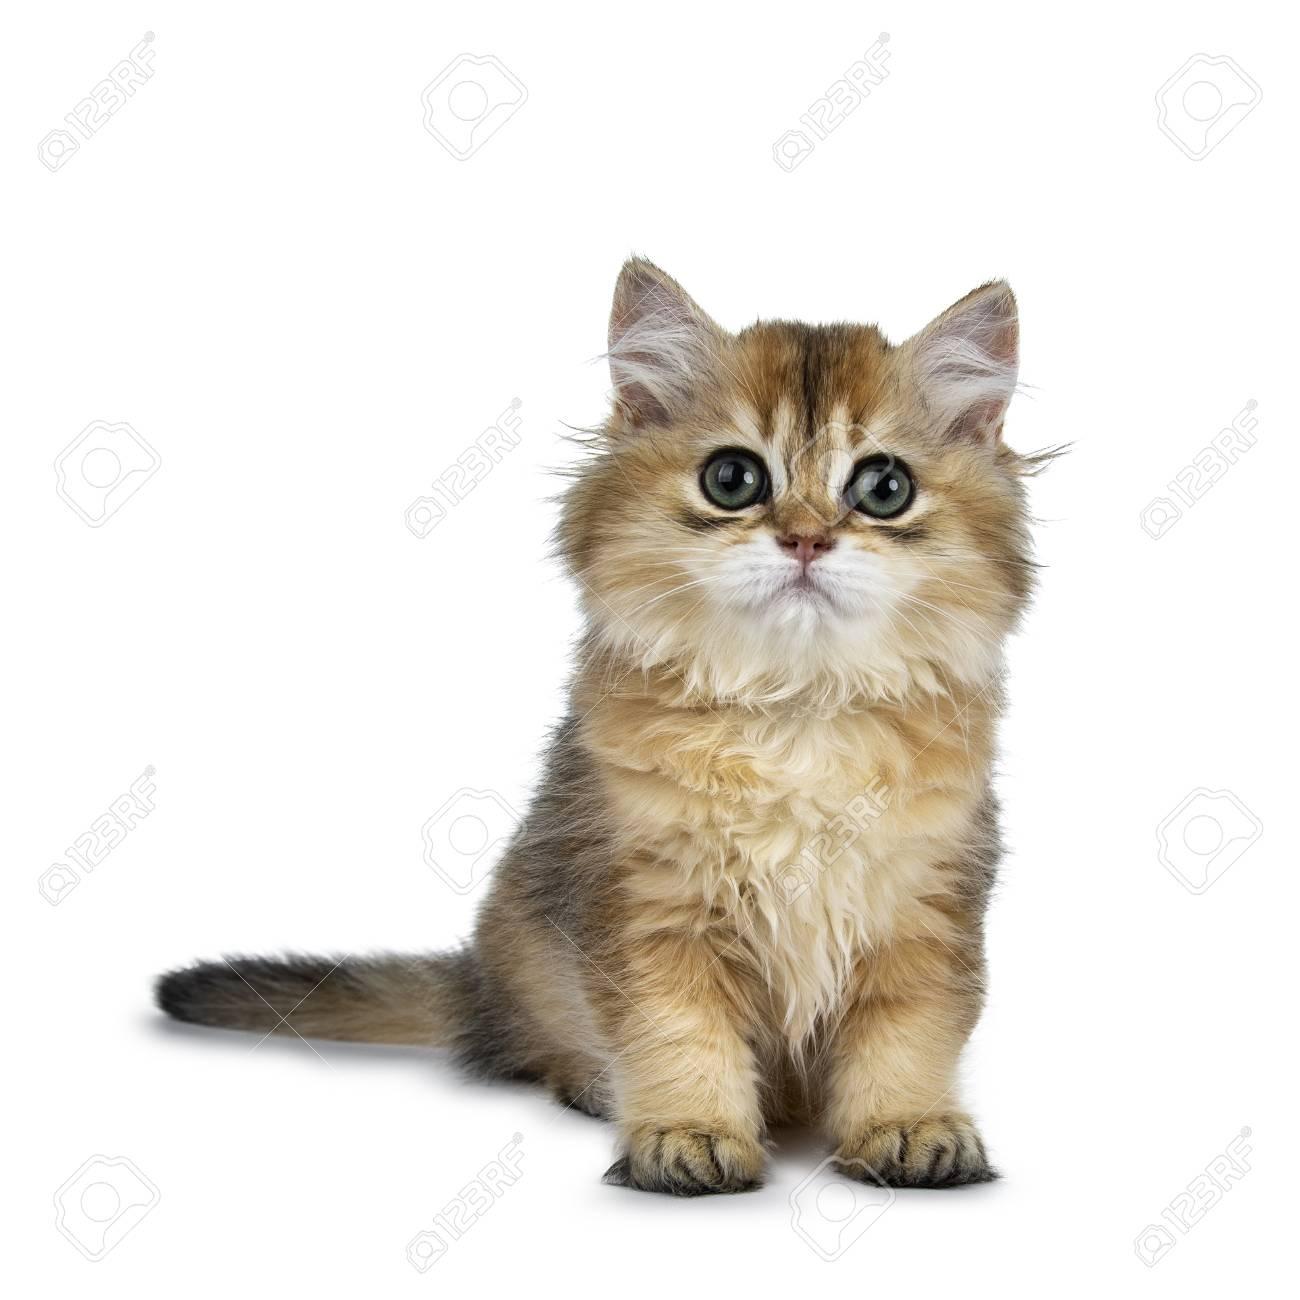 Excellent golden British Shorthair cat sitting in front, looking